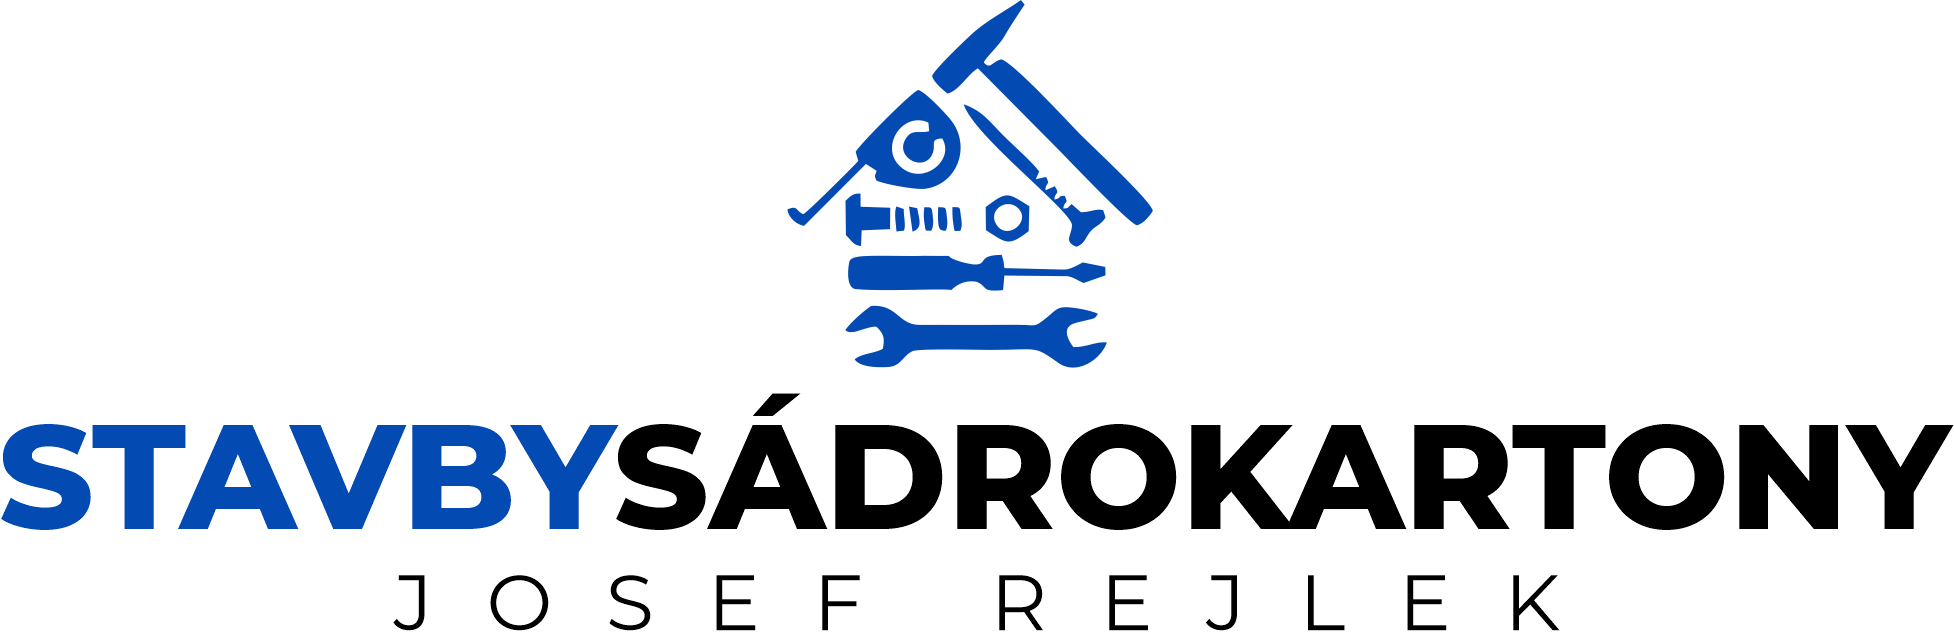 Stavby sádrokartony